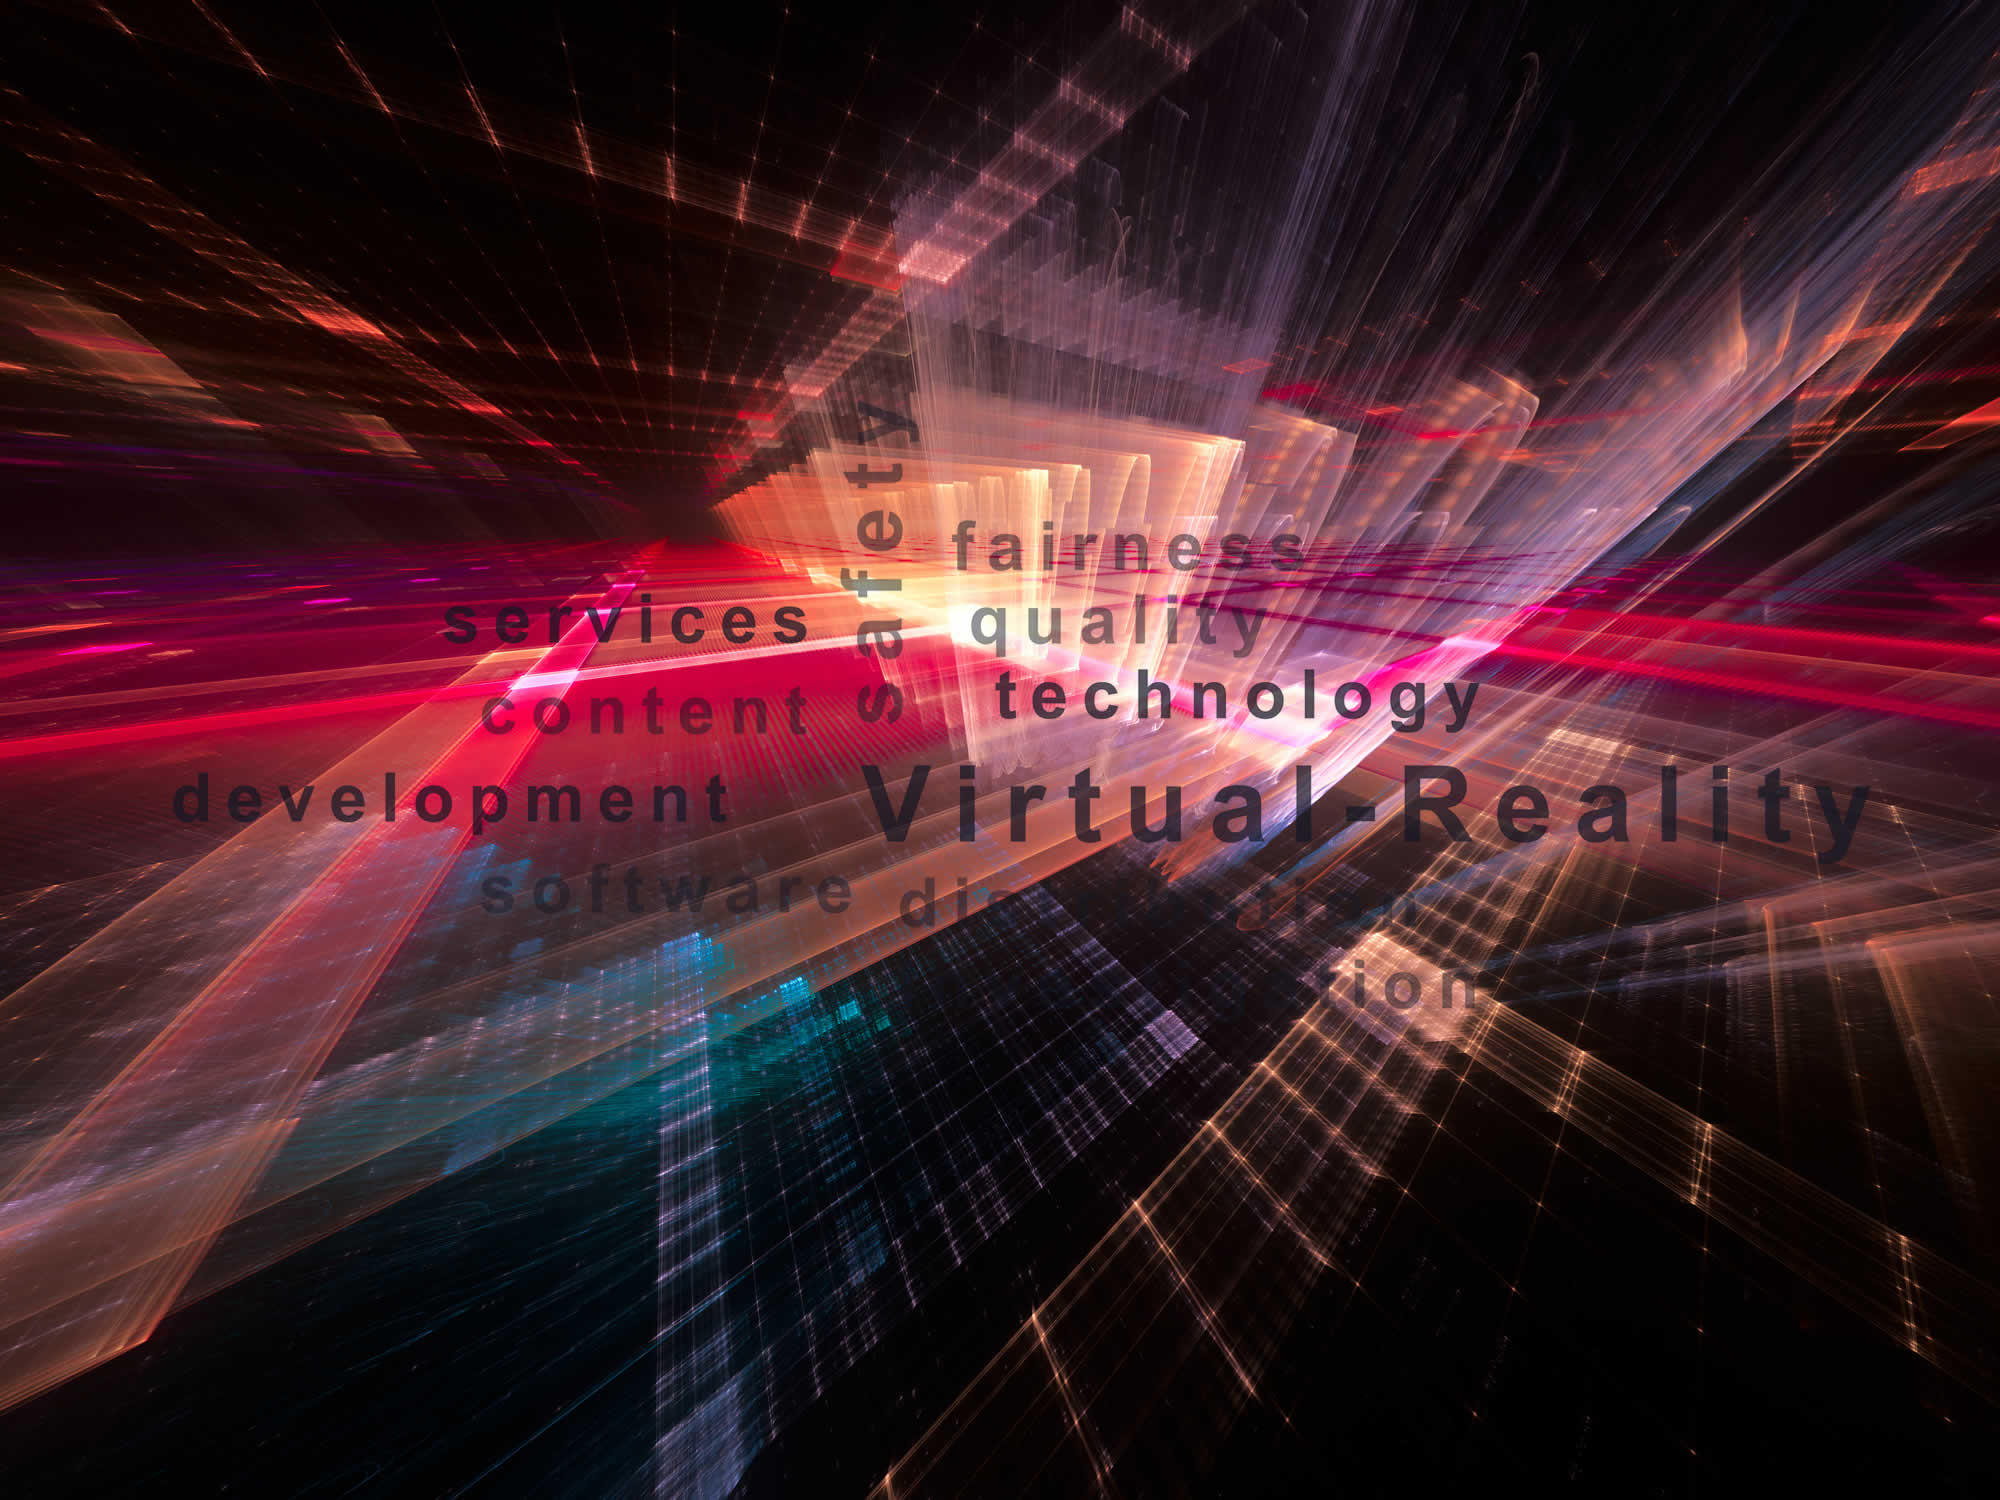 JVR 一般社団法人 日本VR振興普及協会